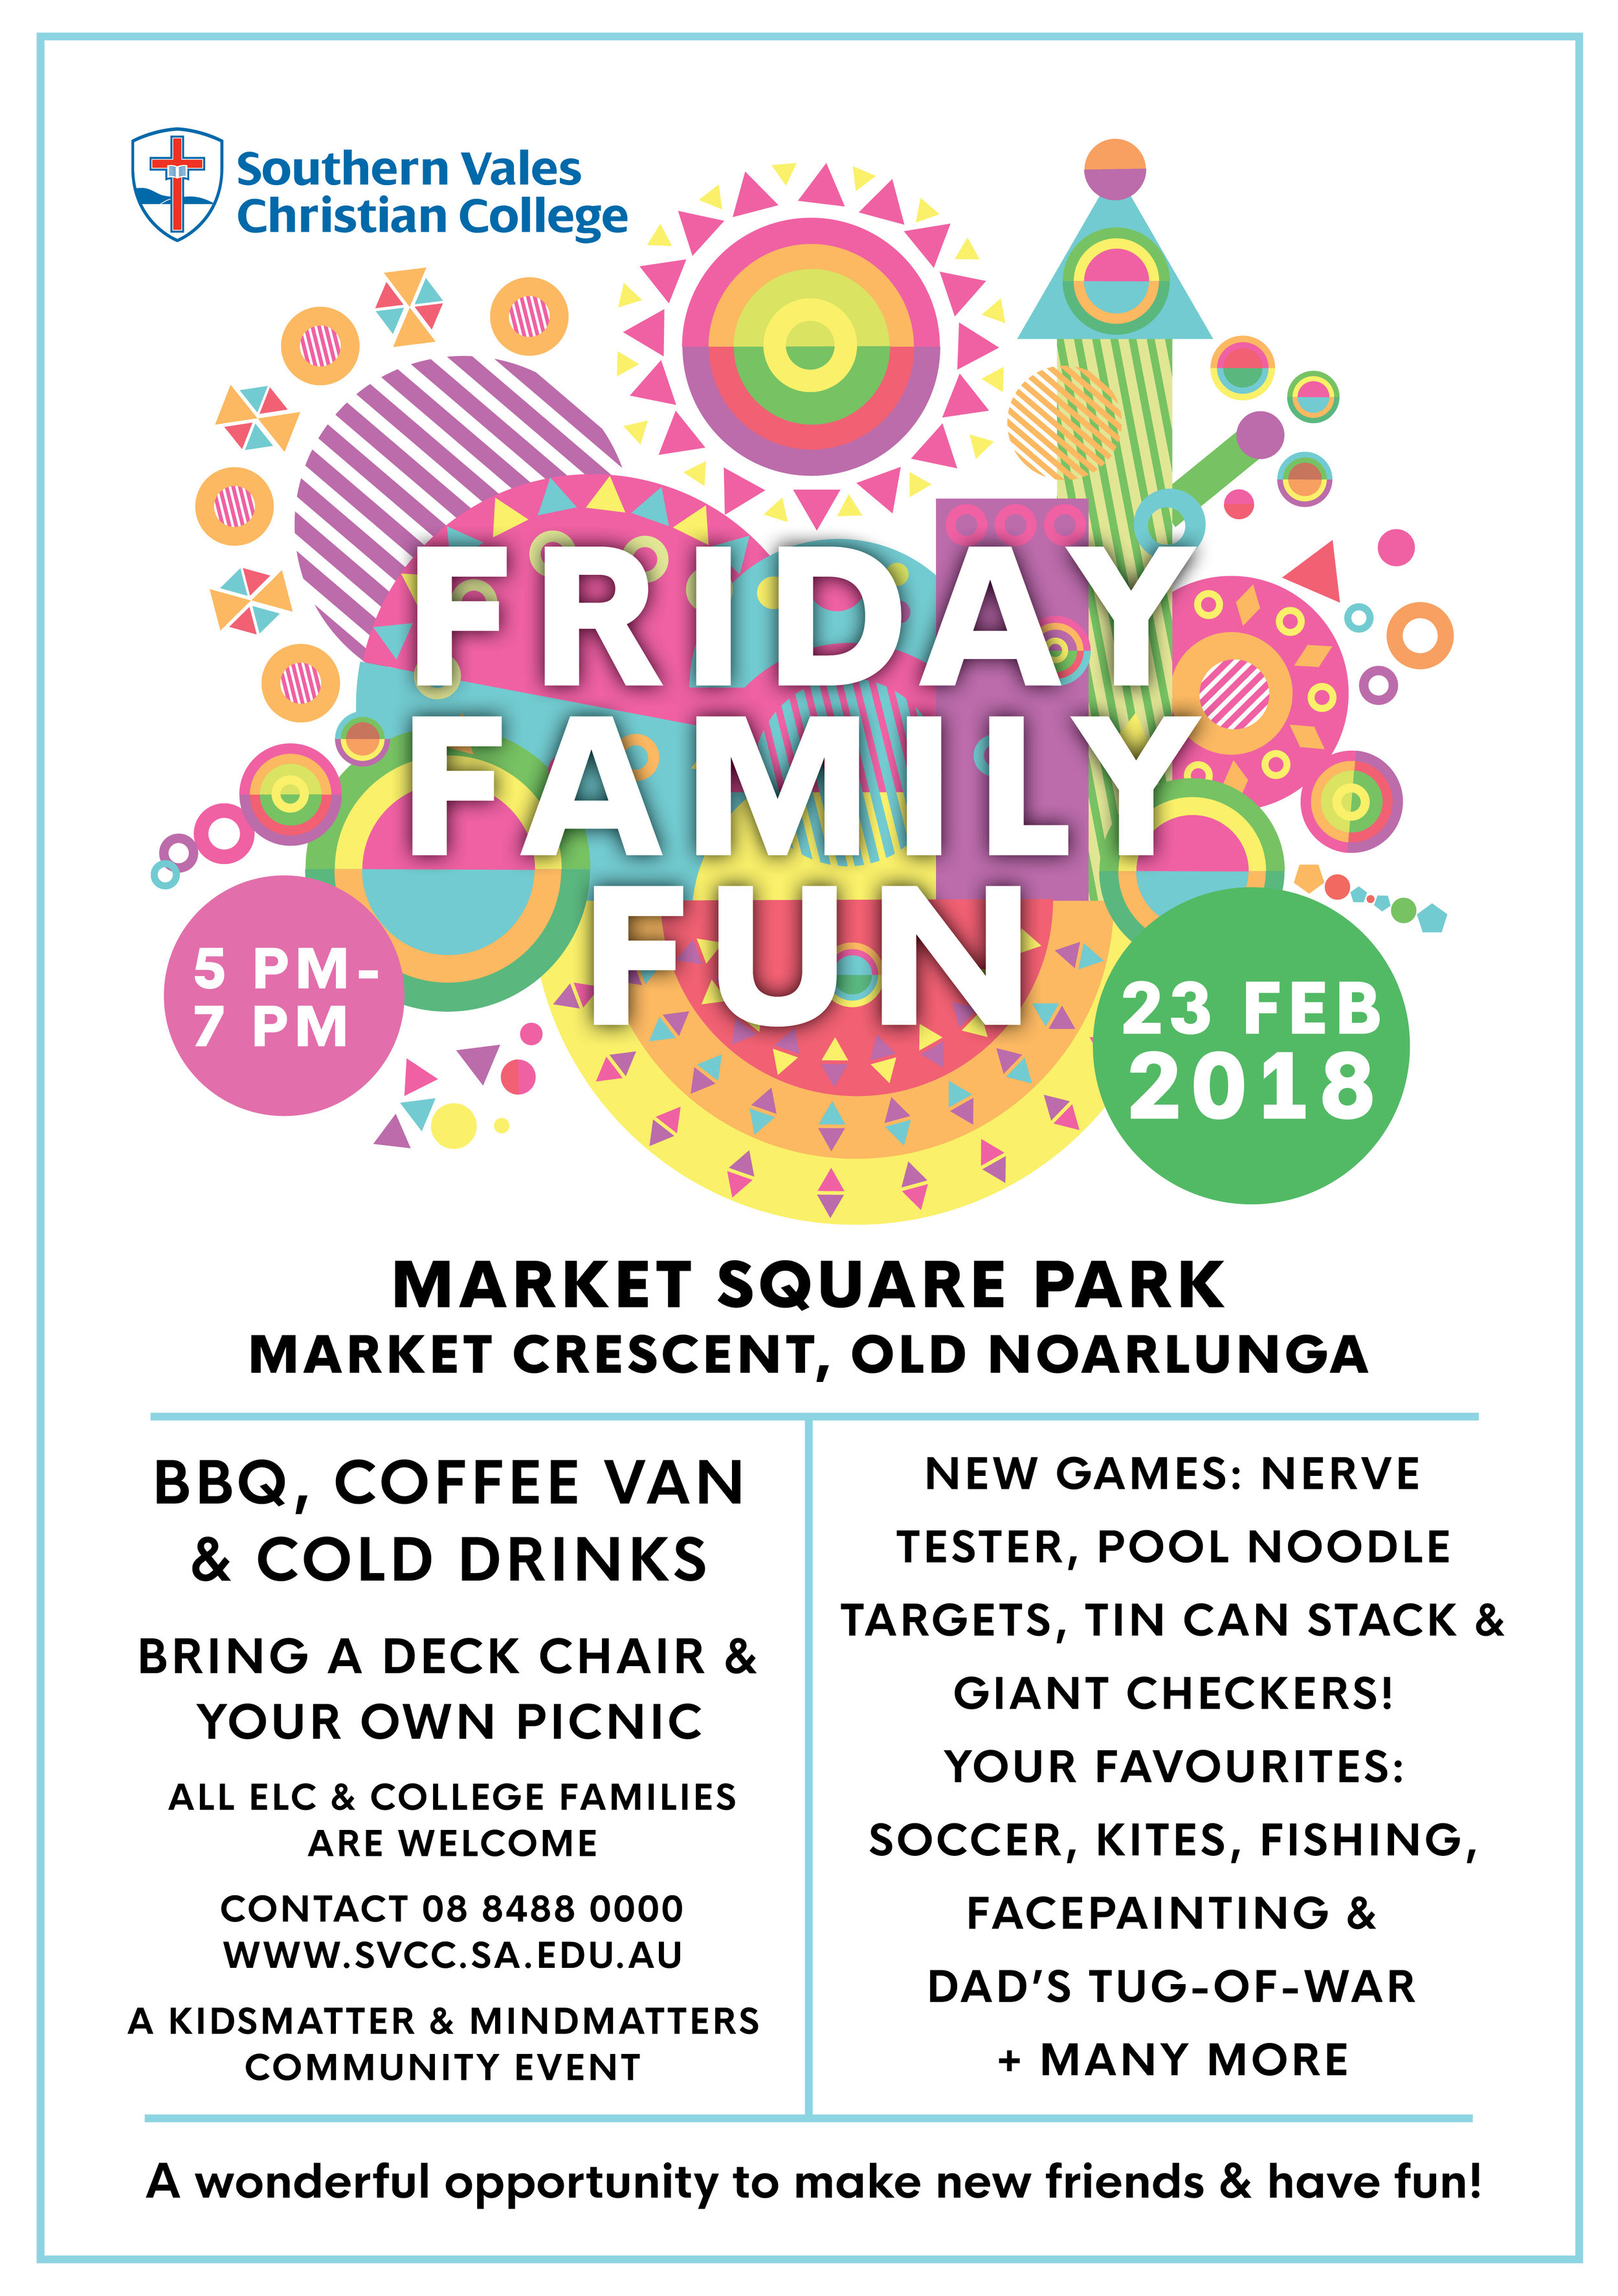 Friday Family Fun Flyer 2018.jpg